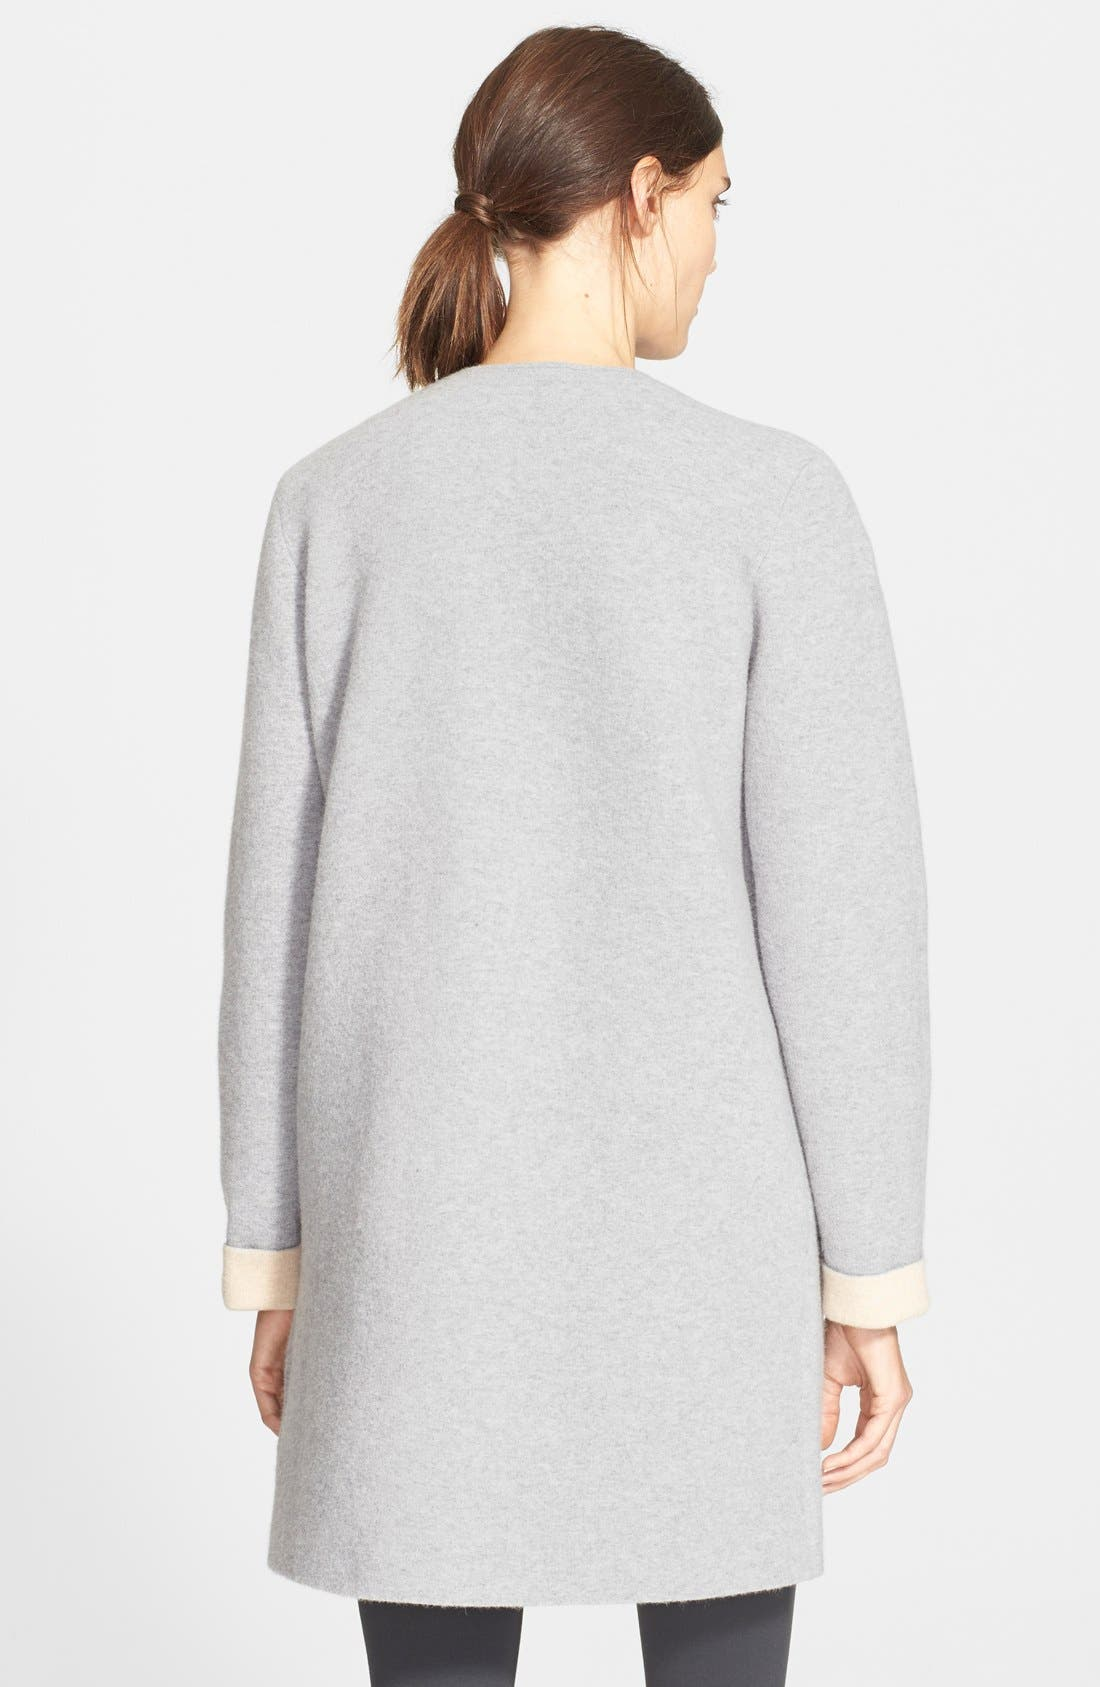 THEORY,                             'Nyma K' Merino Wool Blend Coat,                             Alternate thumbnail 3, color,                             092